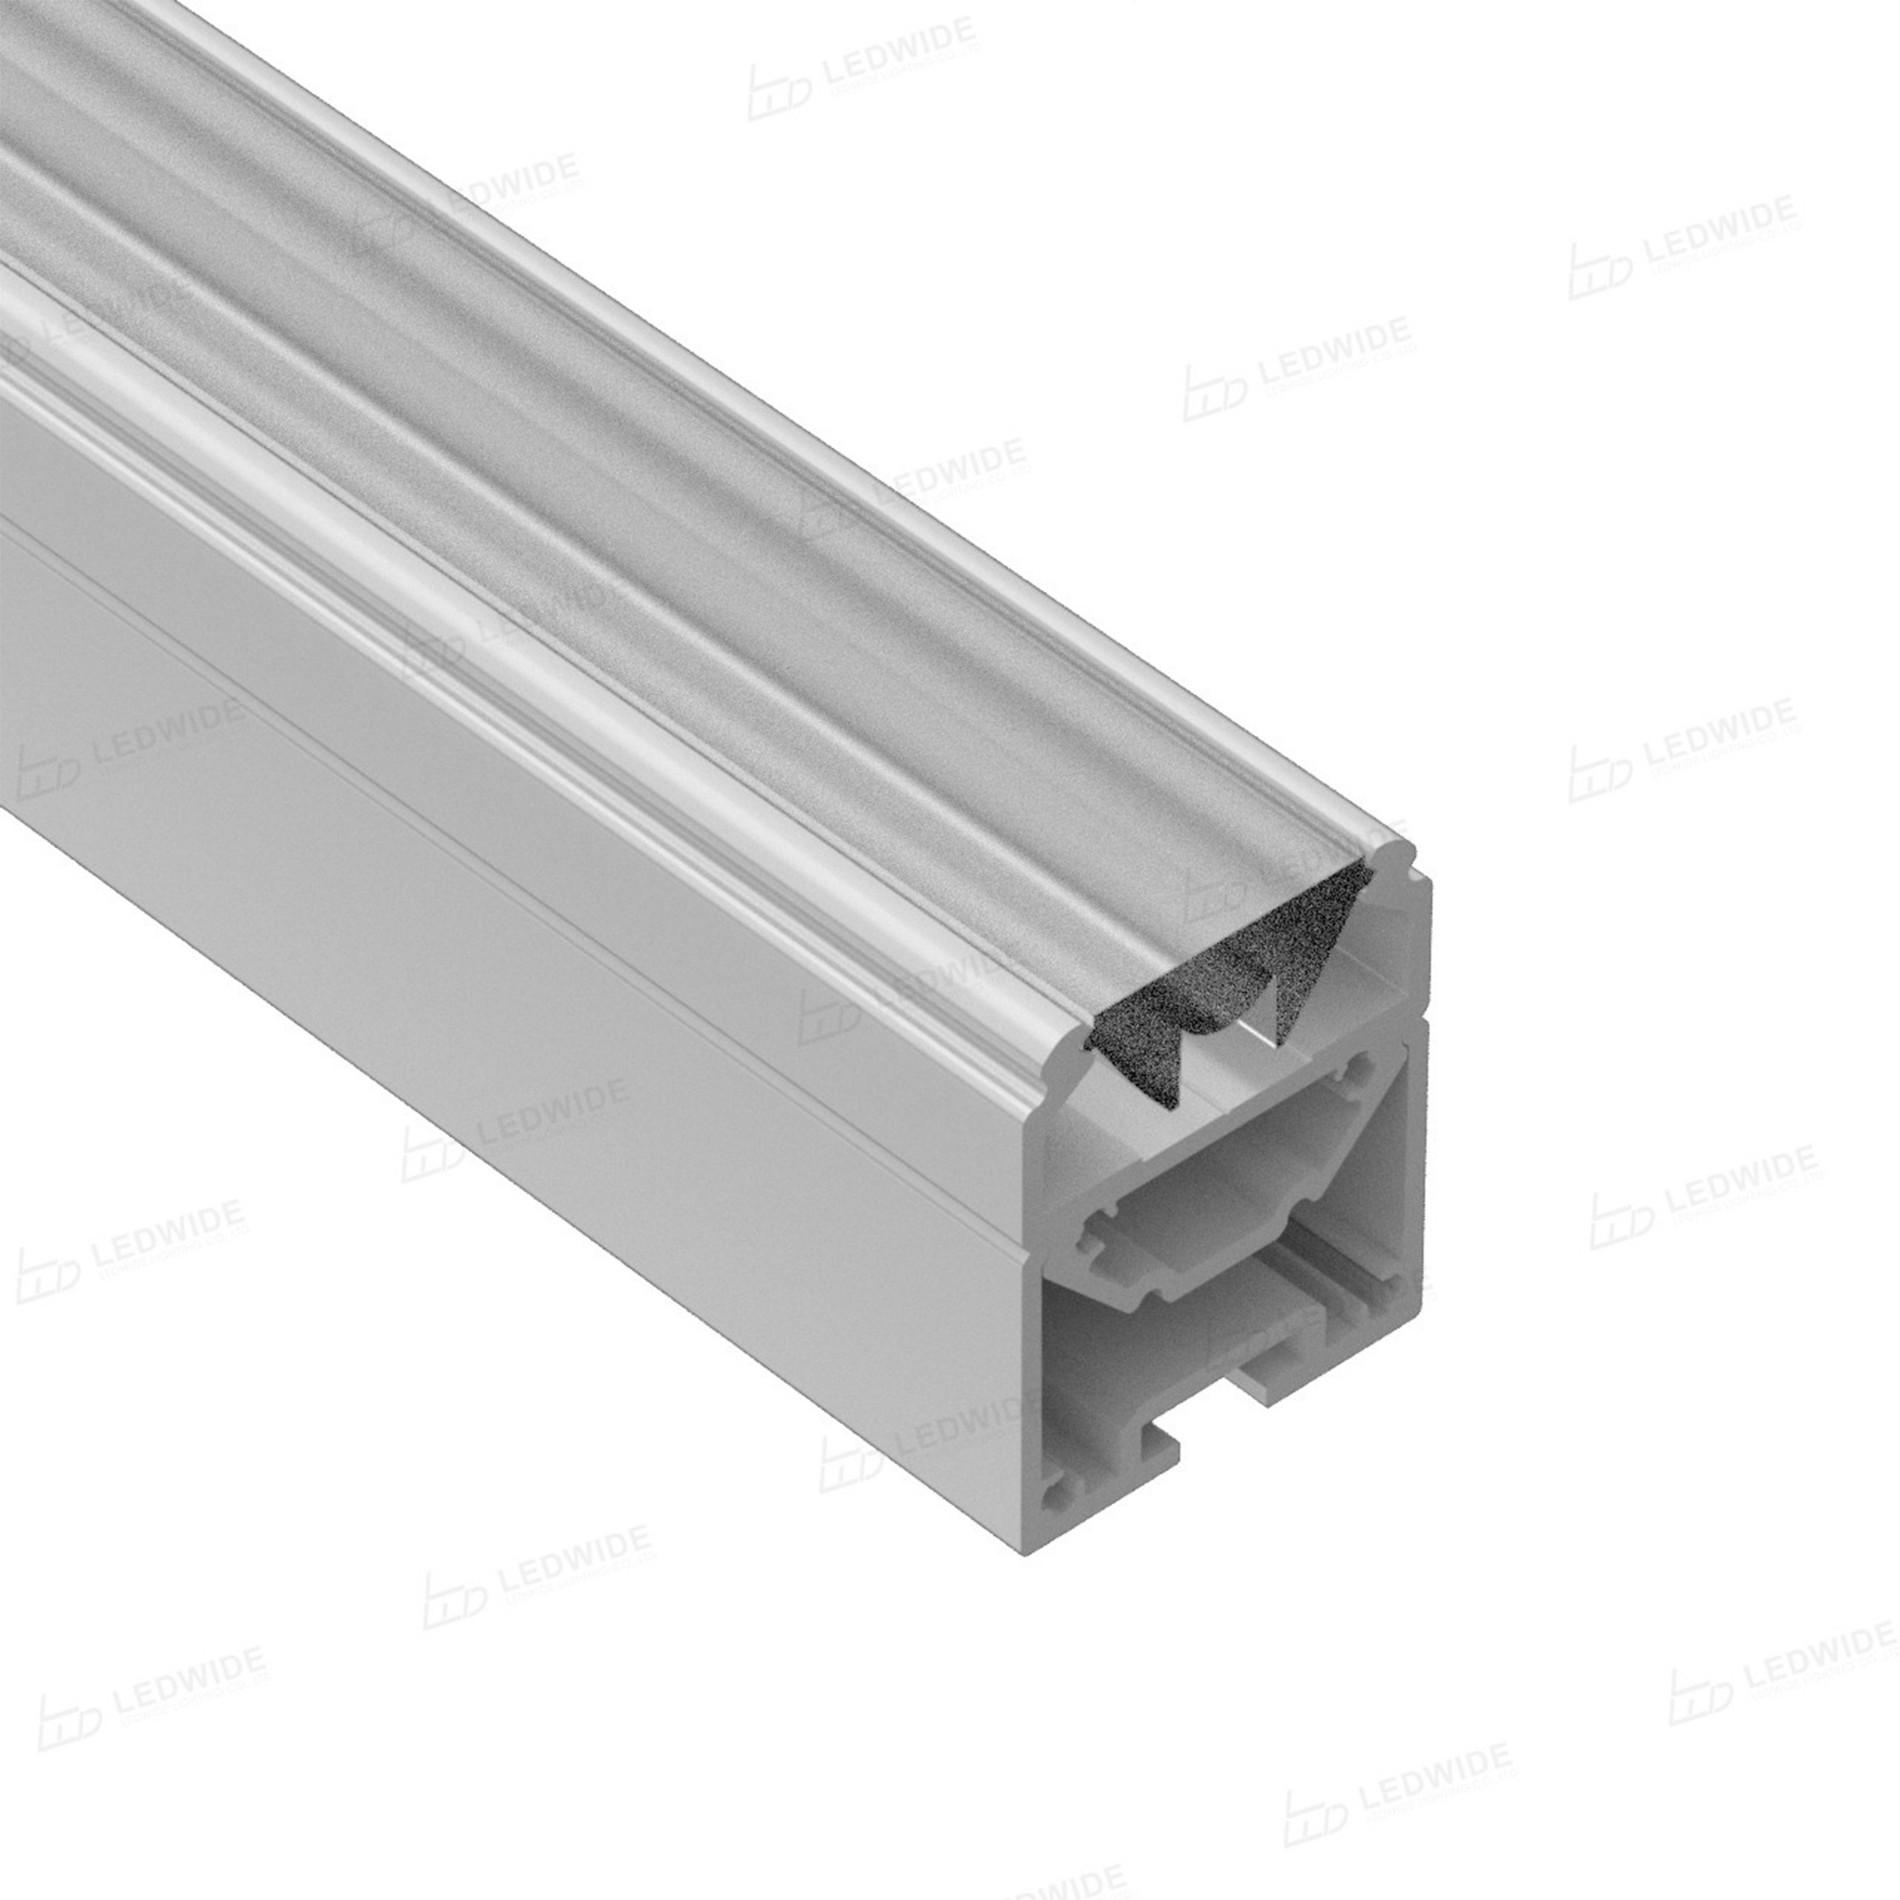 AT15-30 Base de perfil de aluminio ajustable para un uso versátil 25x29.7 mm